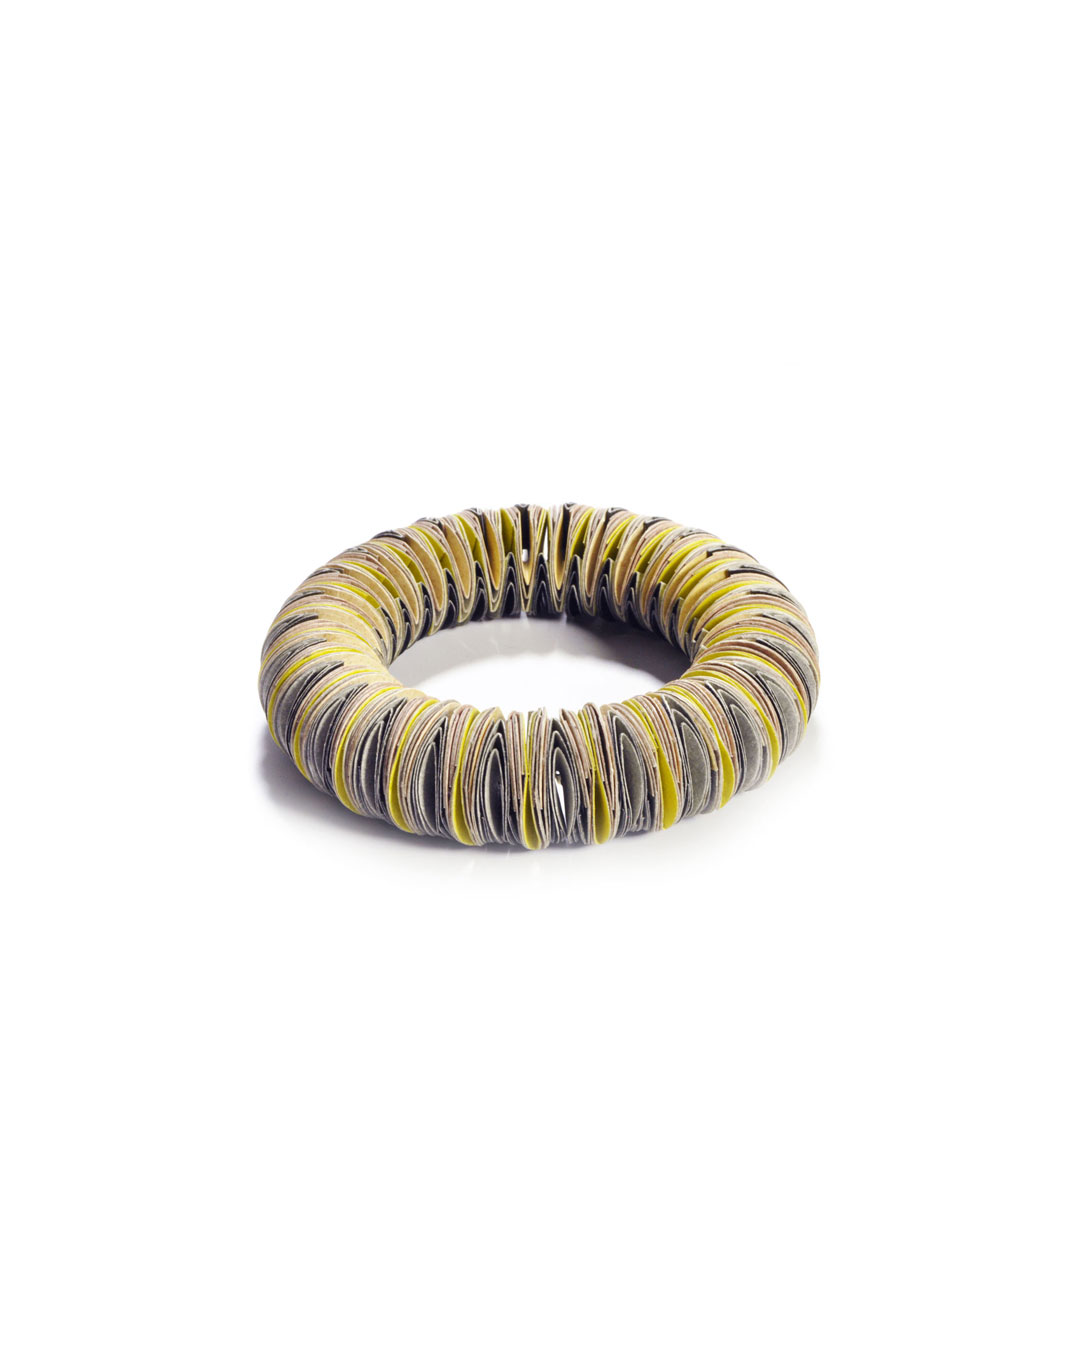 Nel Linssen, untitled, 2013, bracelet; paper, 90 x 90 x 20 mm, €760